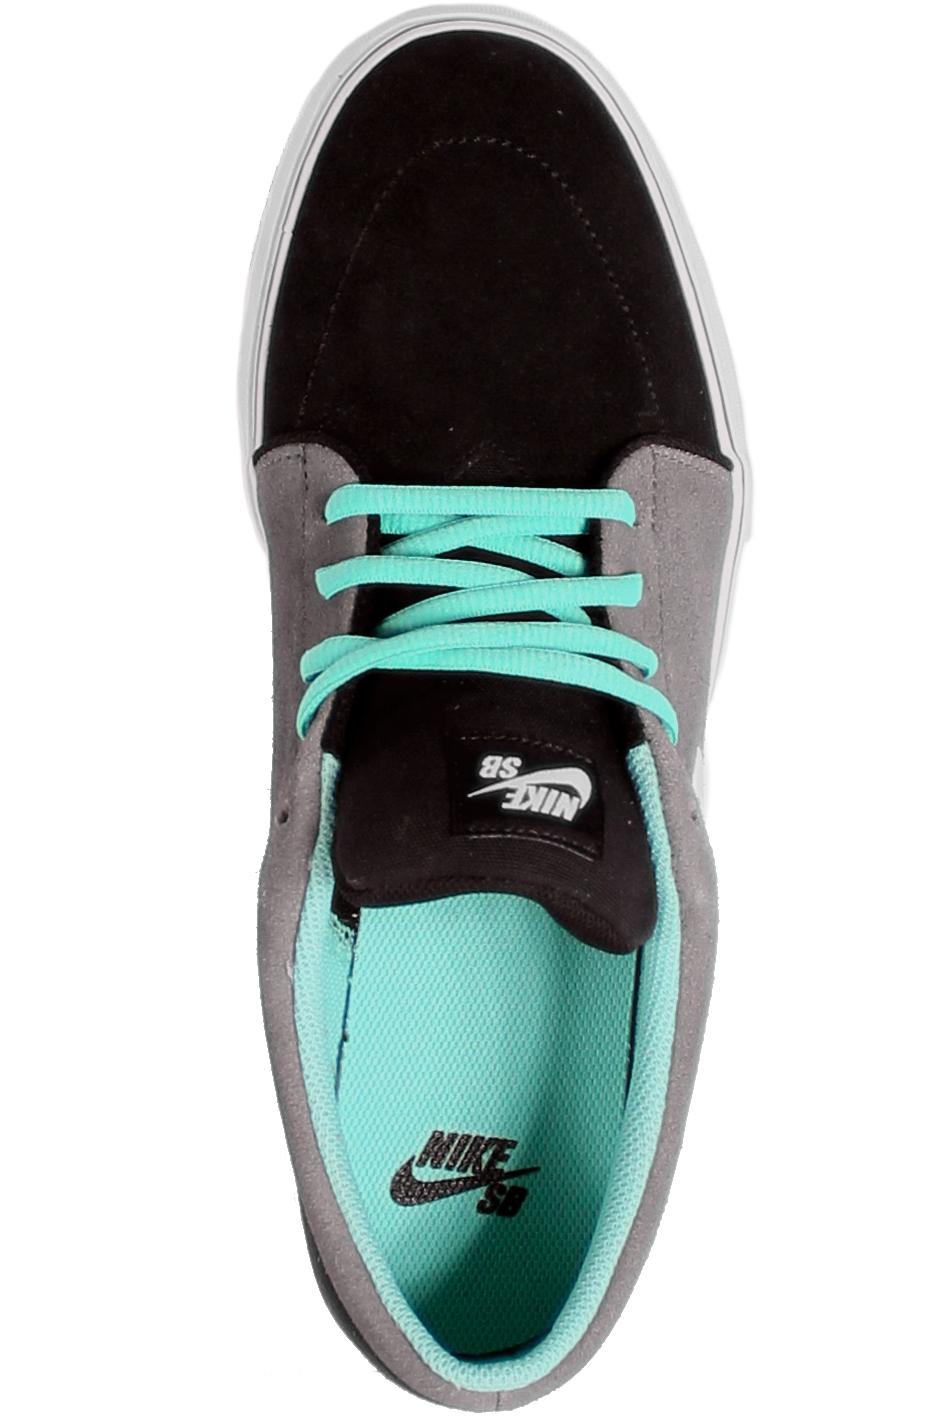 Buty Nike Satire (Black/Dark Grey/Mint)